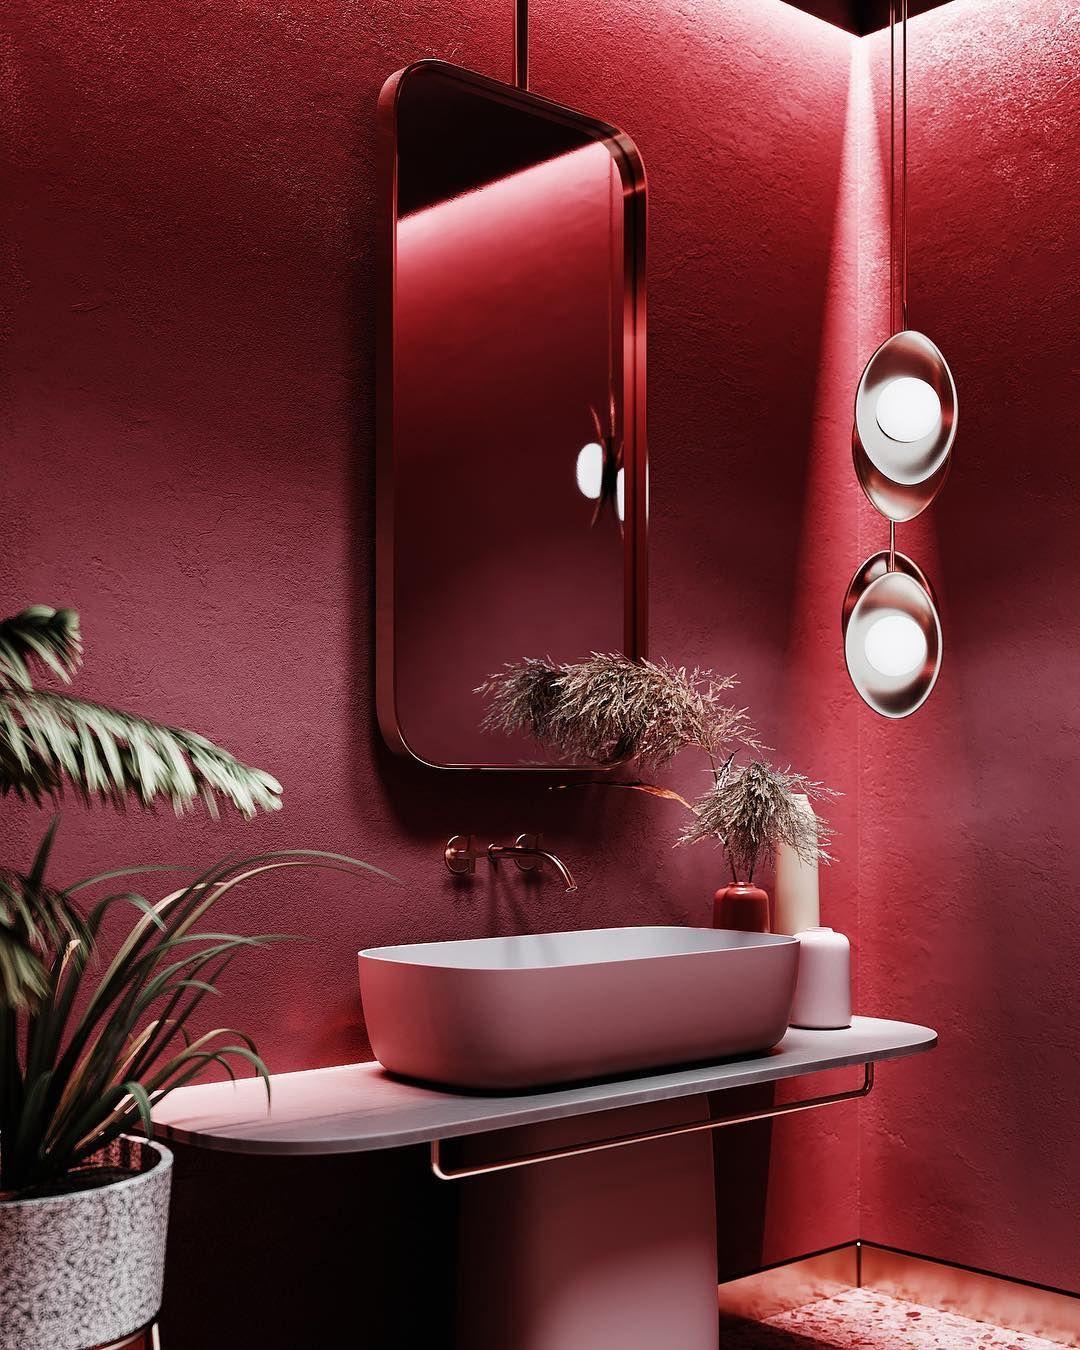 Colour Inspiration From Kie Bathroom Red Bathroom Decor Interior Red bathroom design ideas